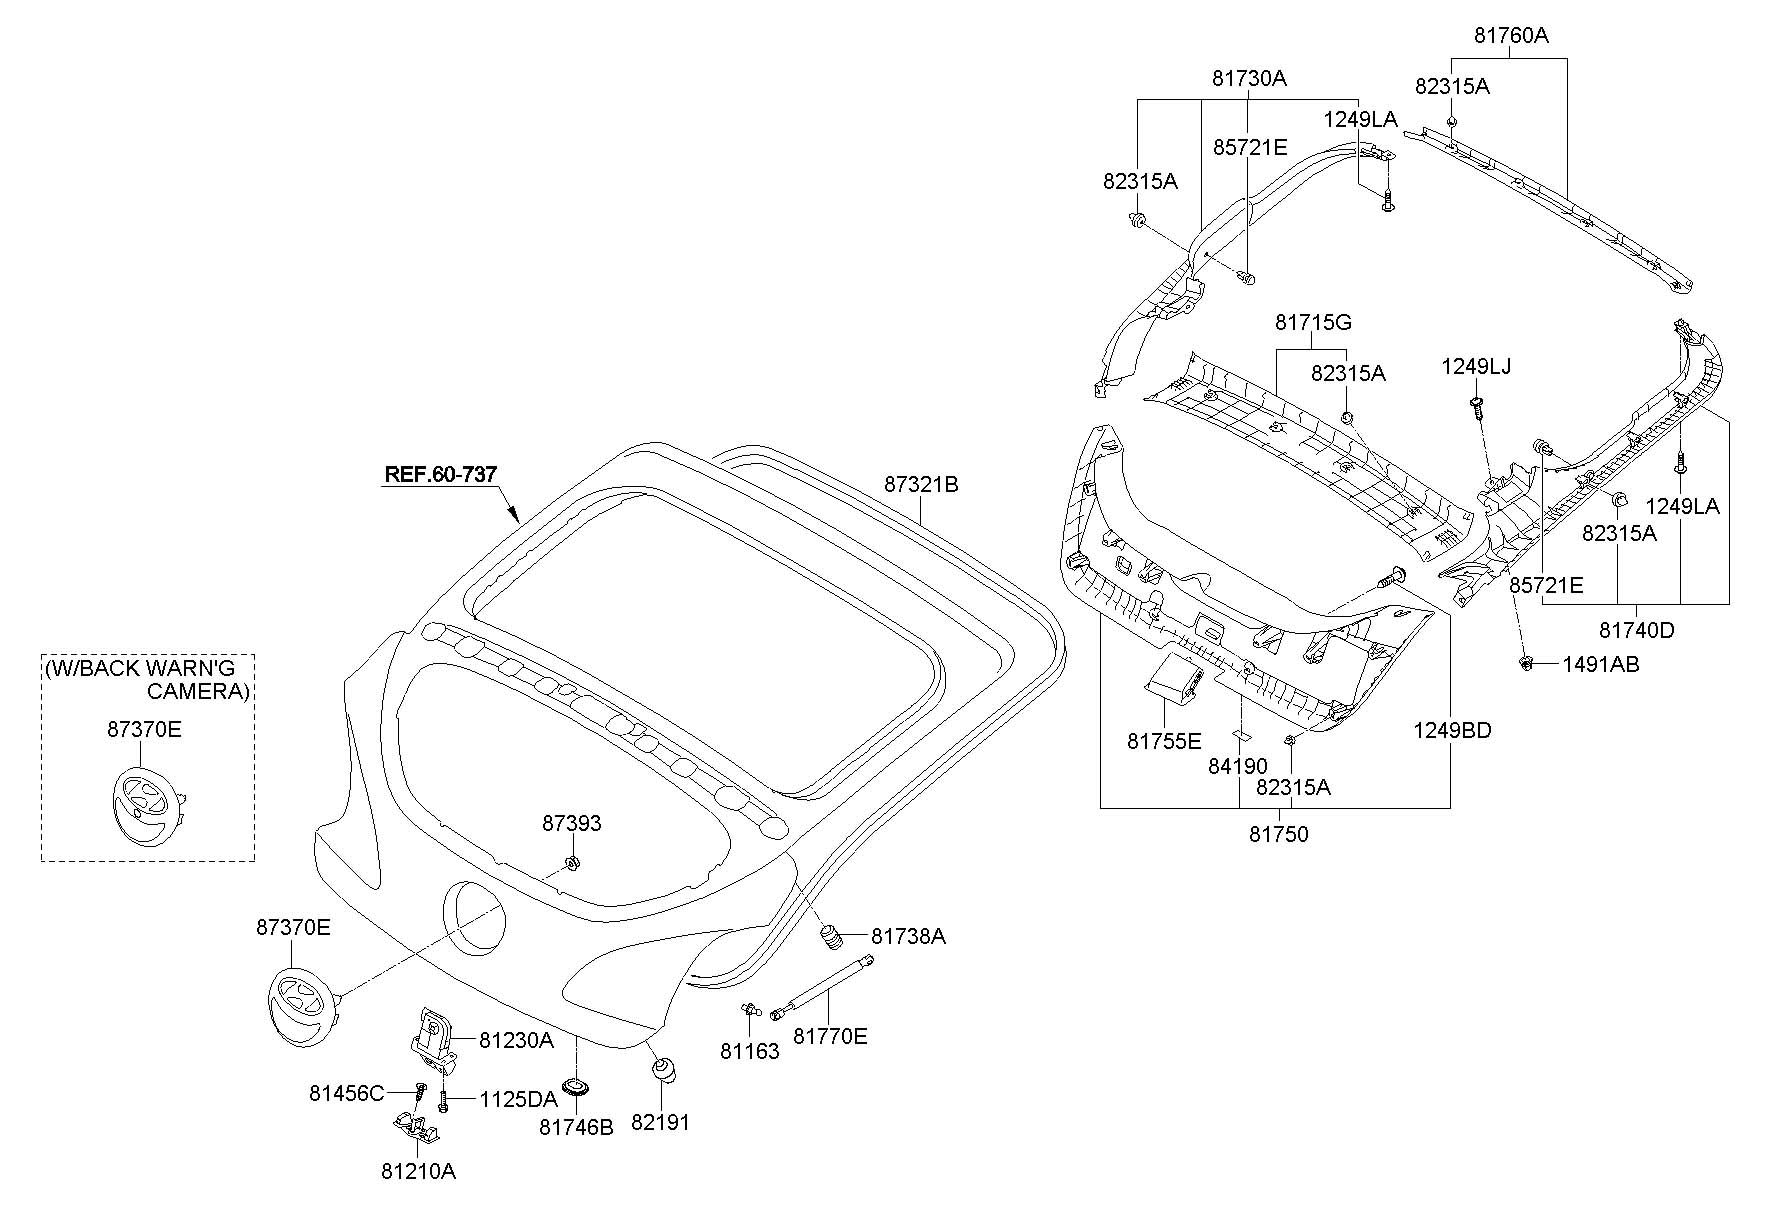 812302v000 - Hyundai Latch Assembly